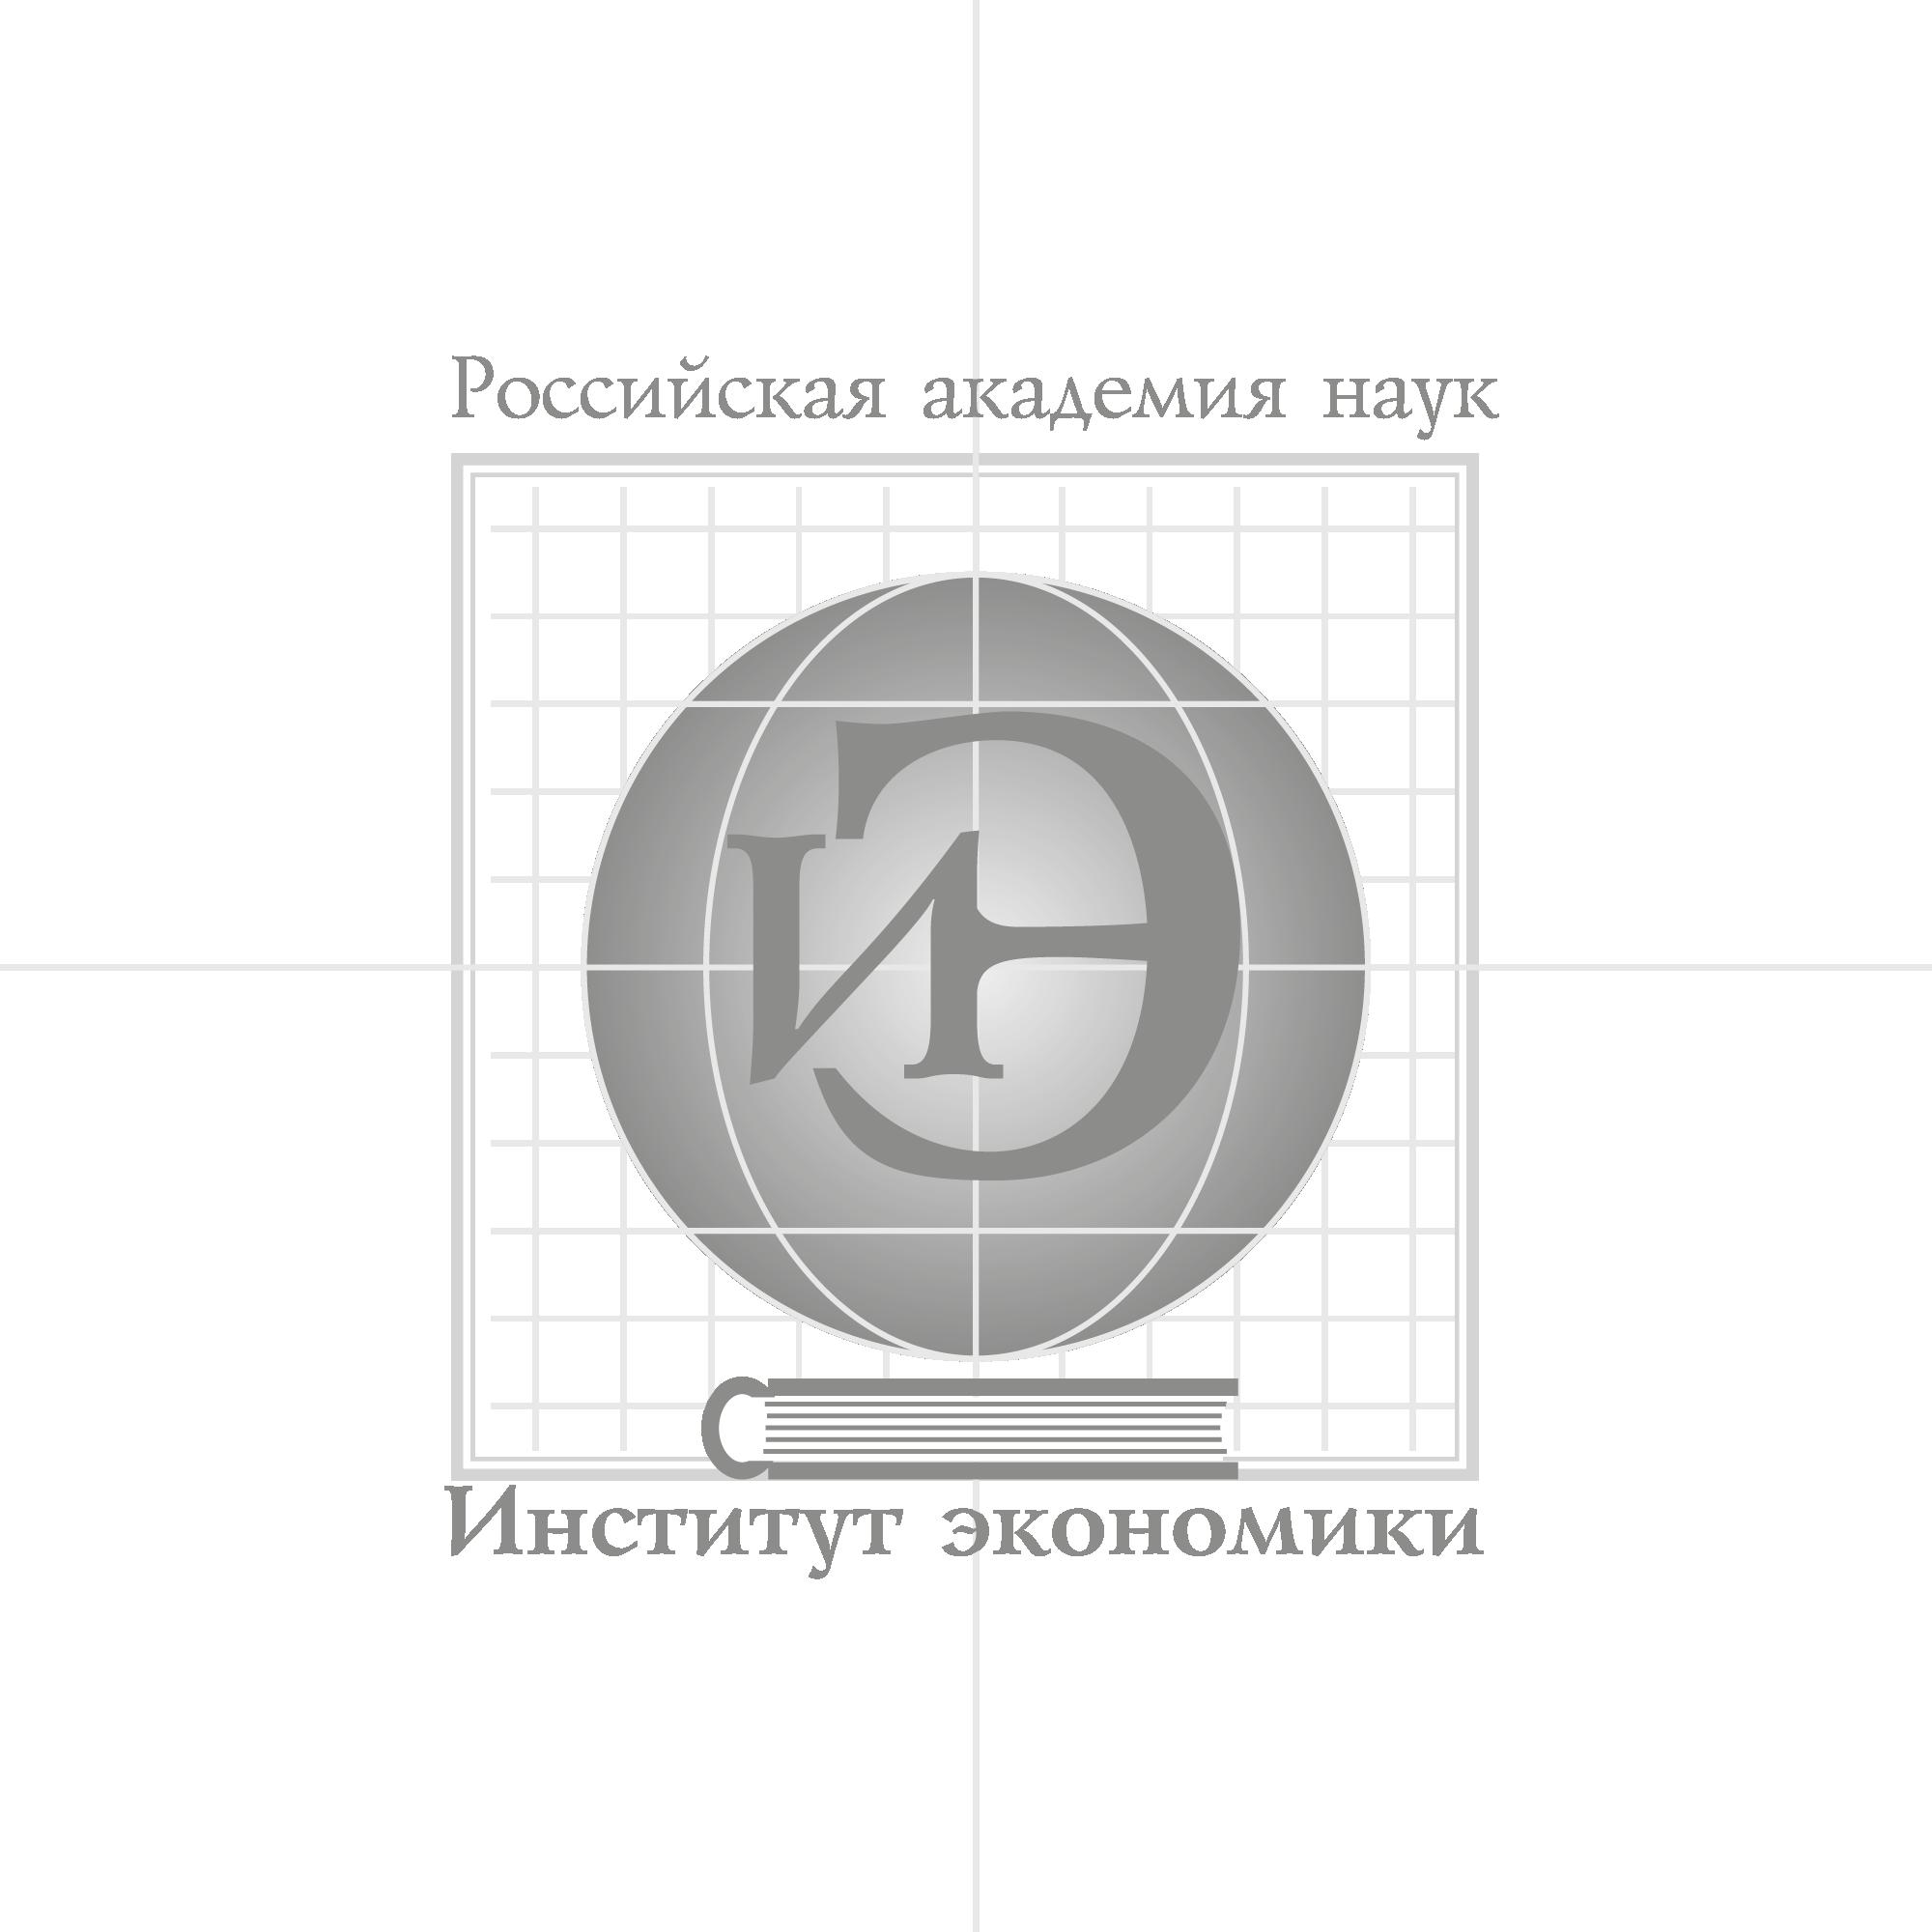 логотип Института экономики РАН